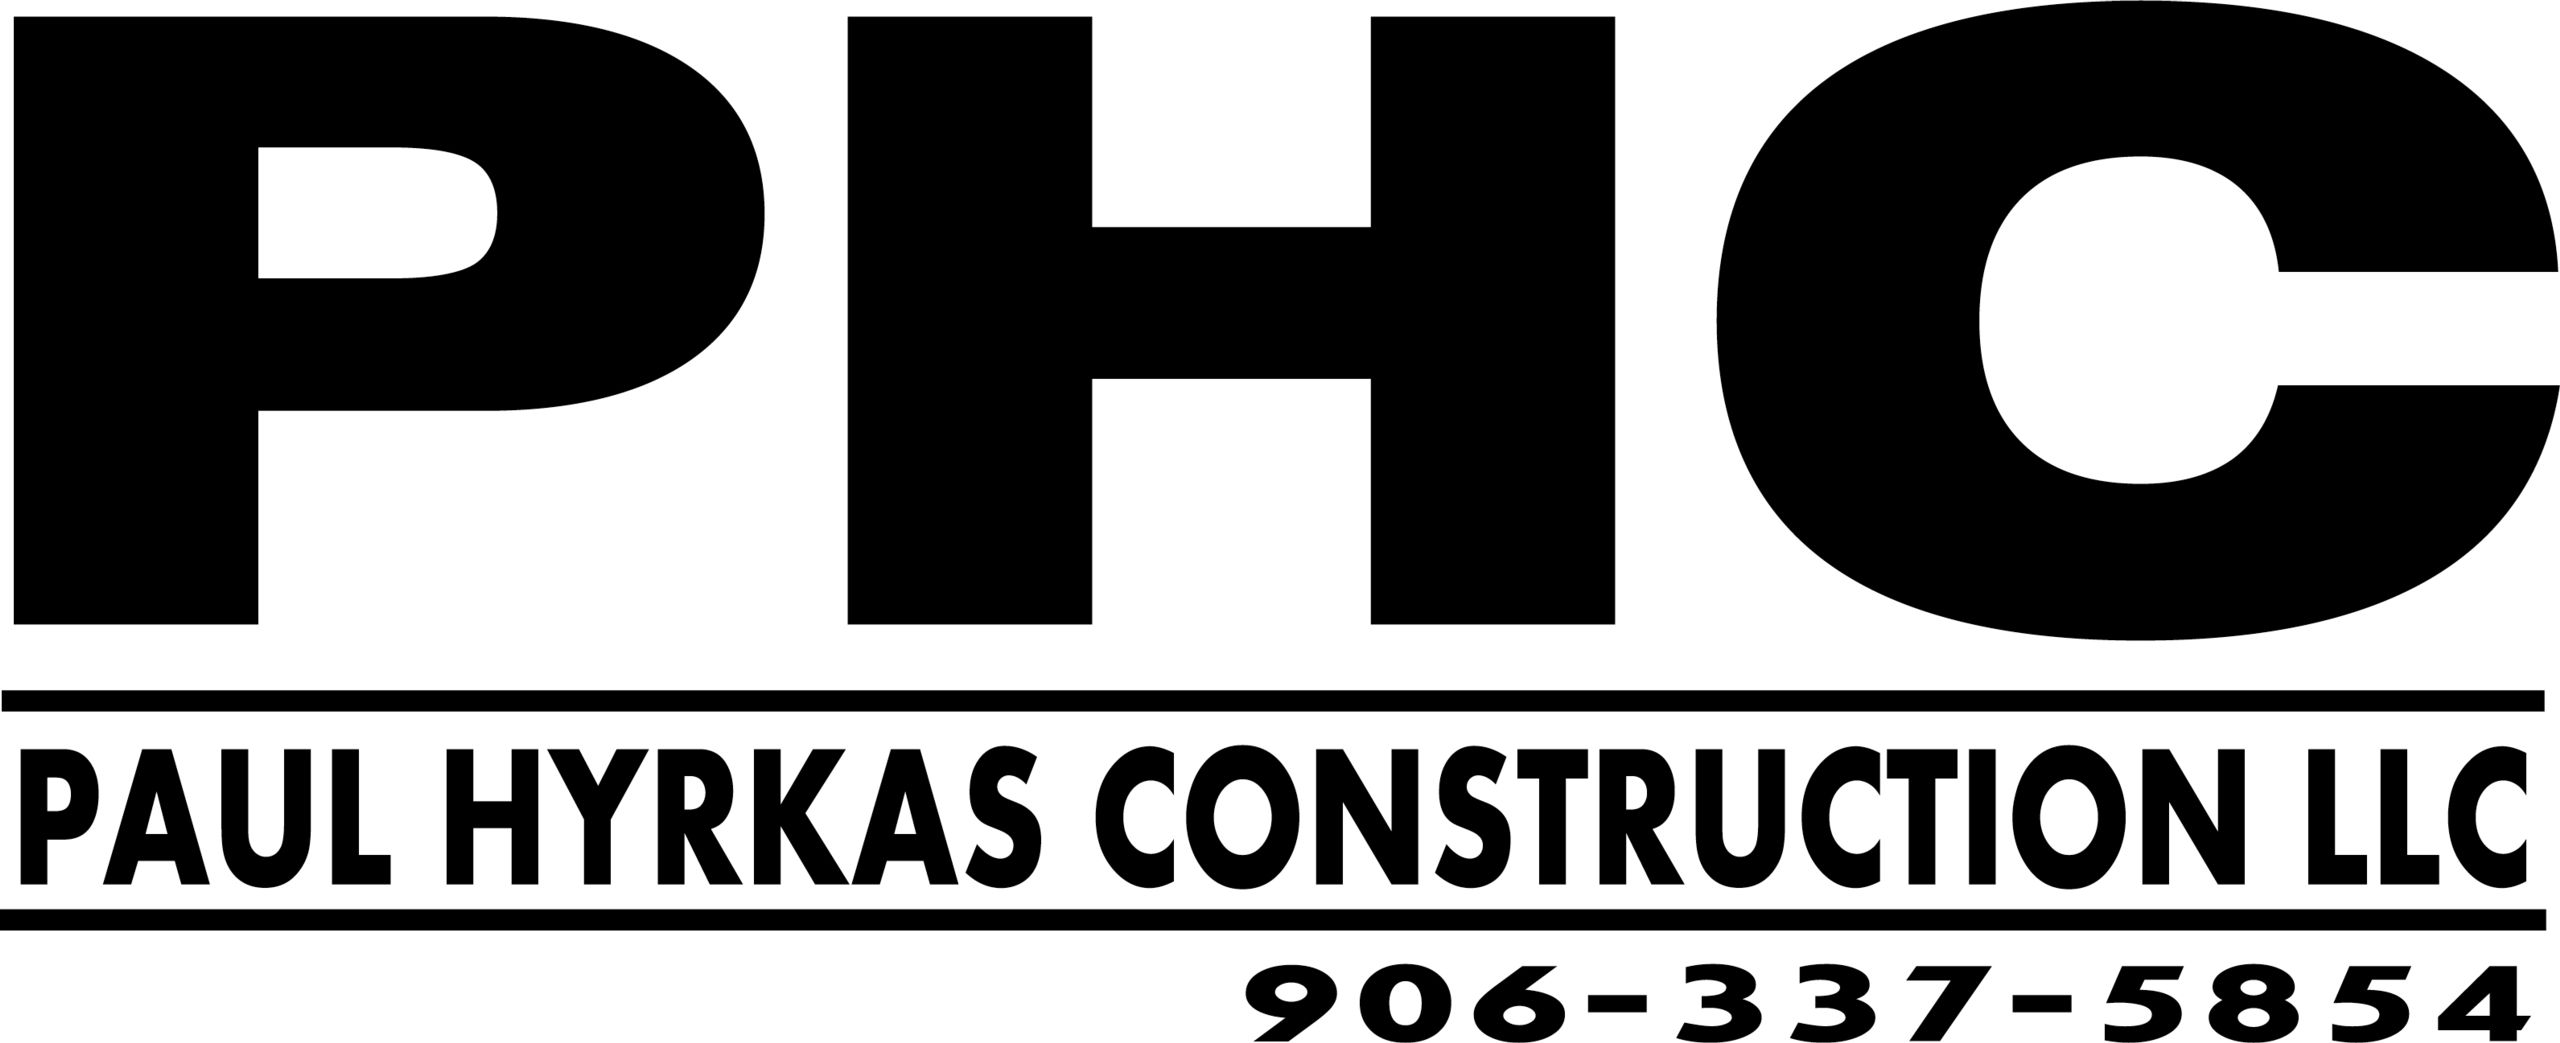 Home Builders Association of the Upper Peninsula Member